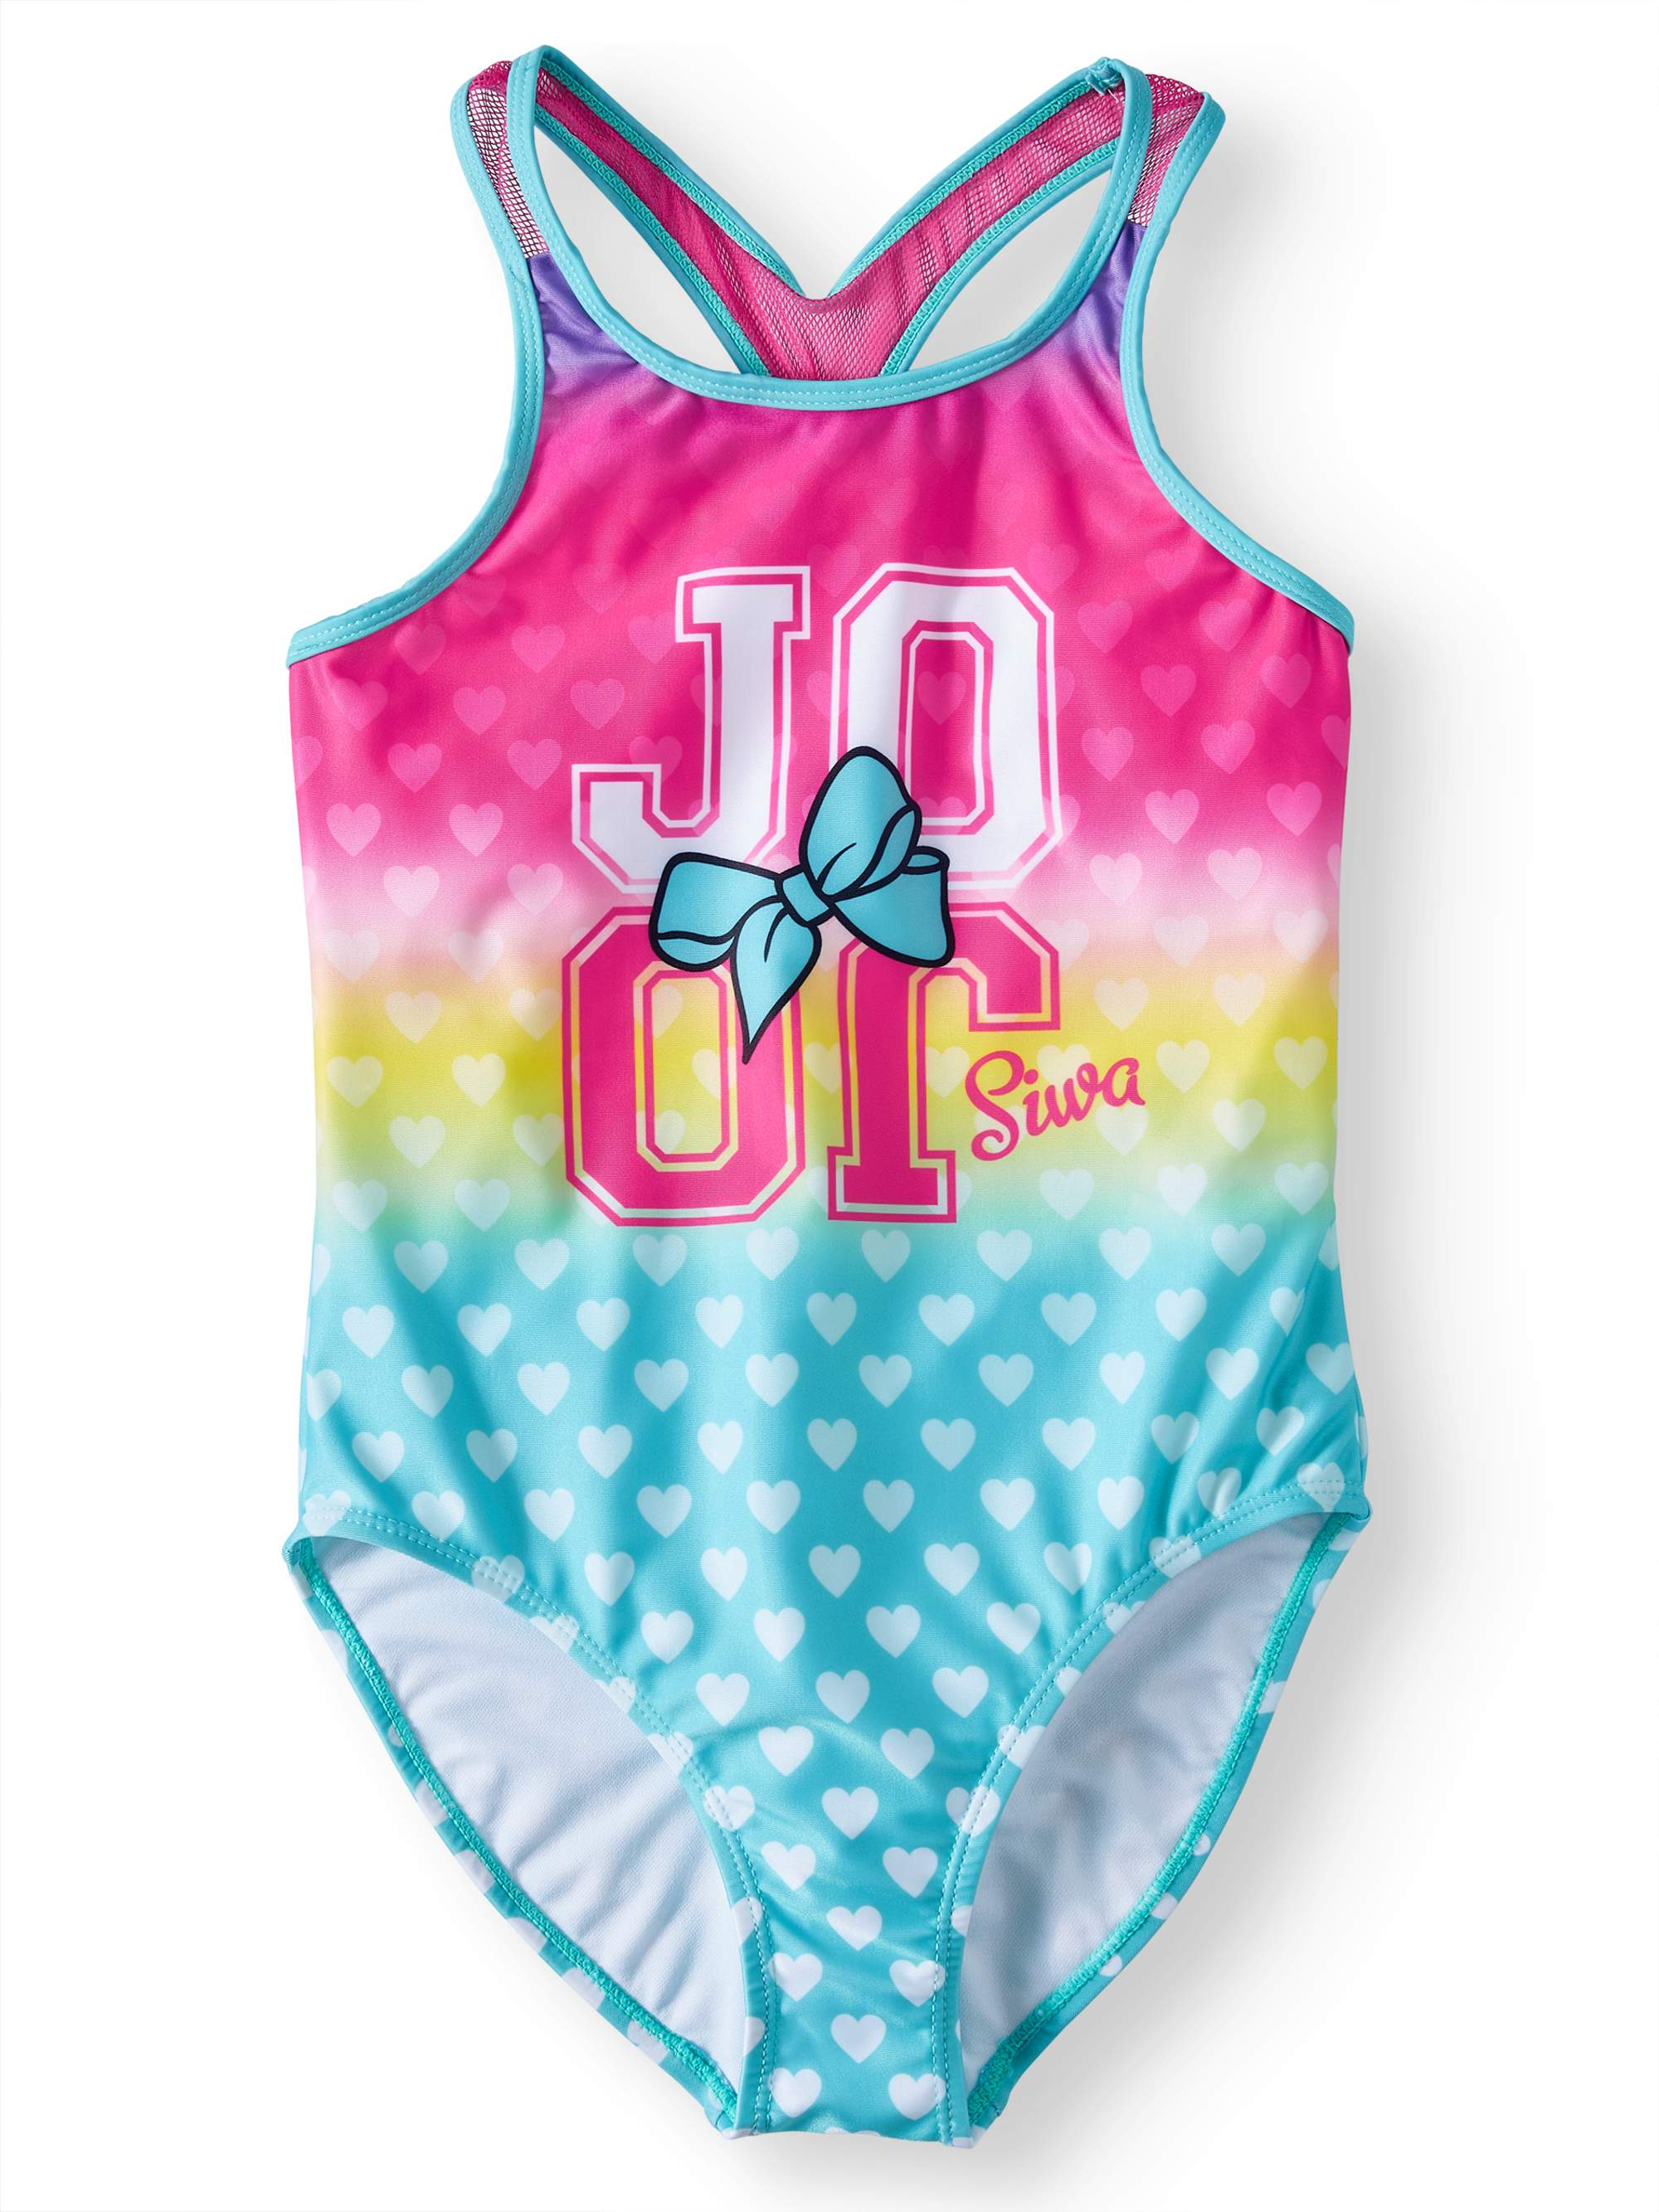 JoJo Siwa Big Girls' One Piece Swimsuit - Pink/Yellow/Blue